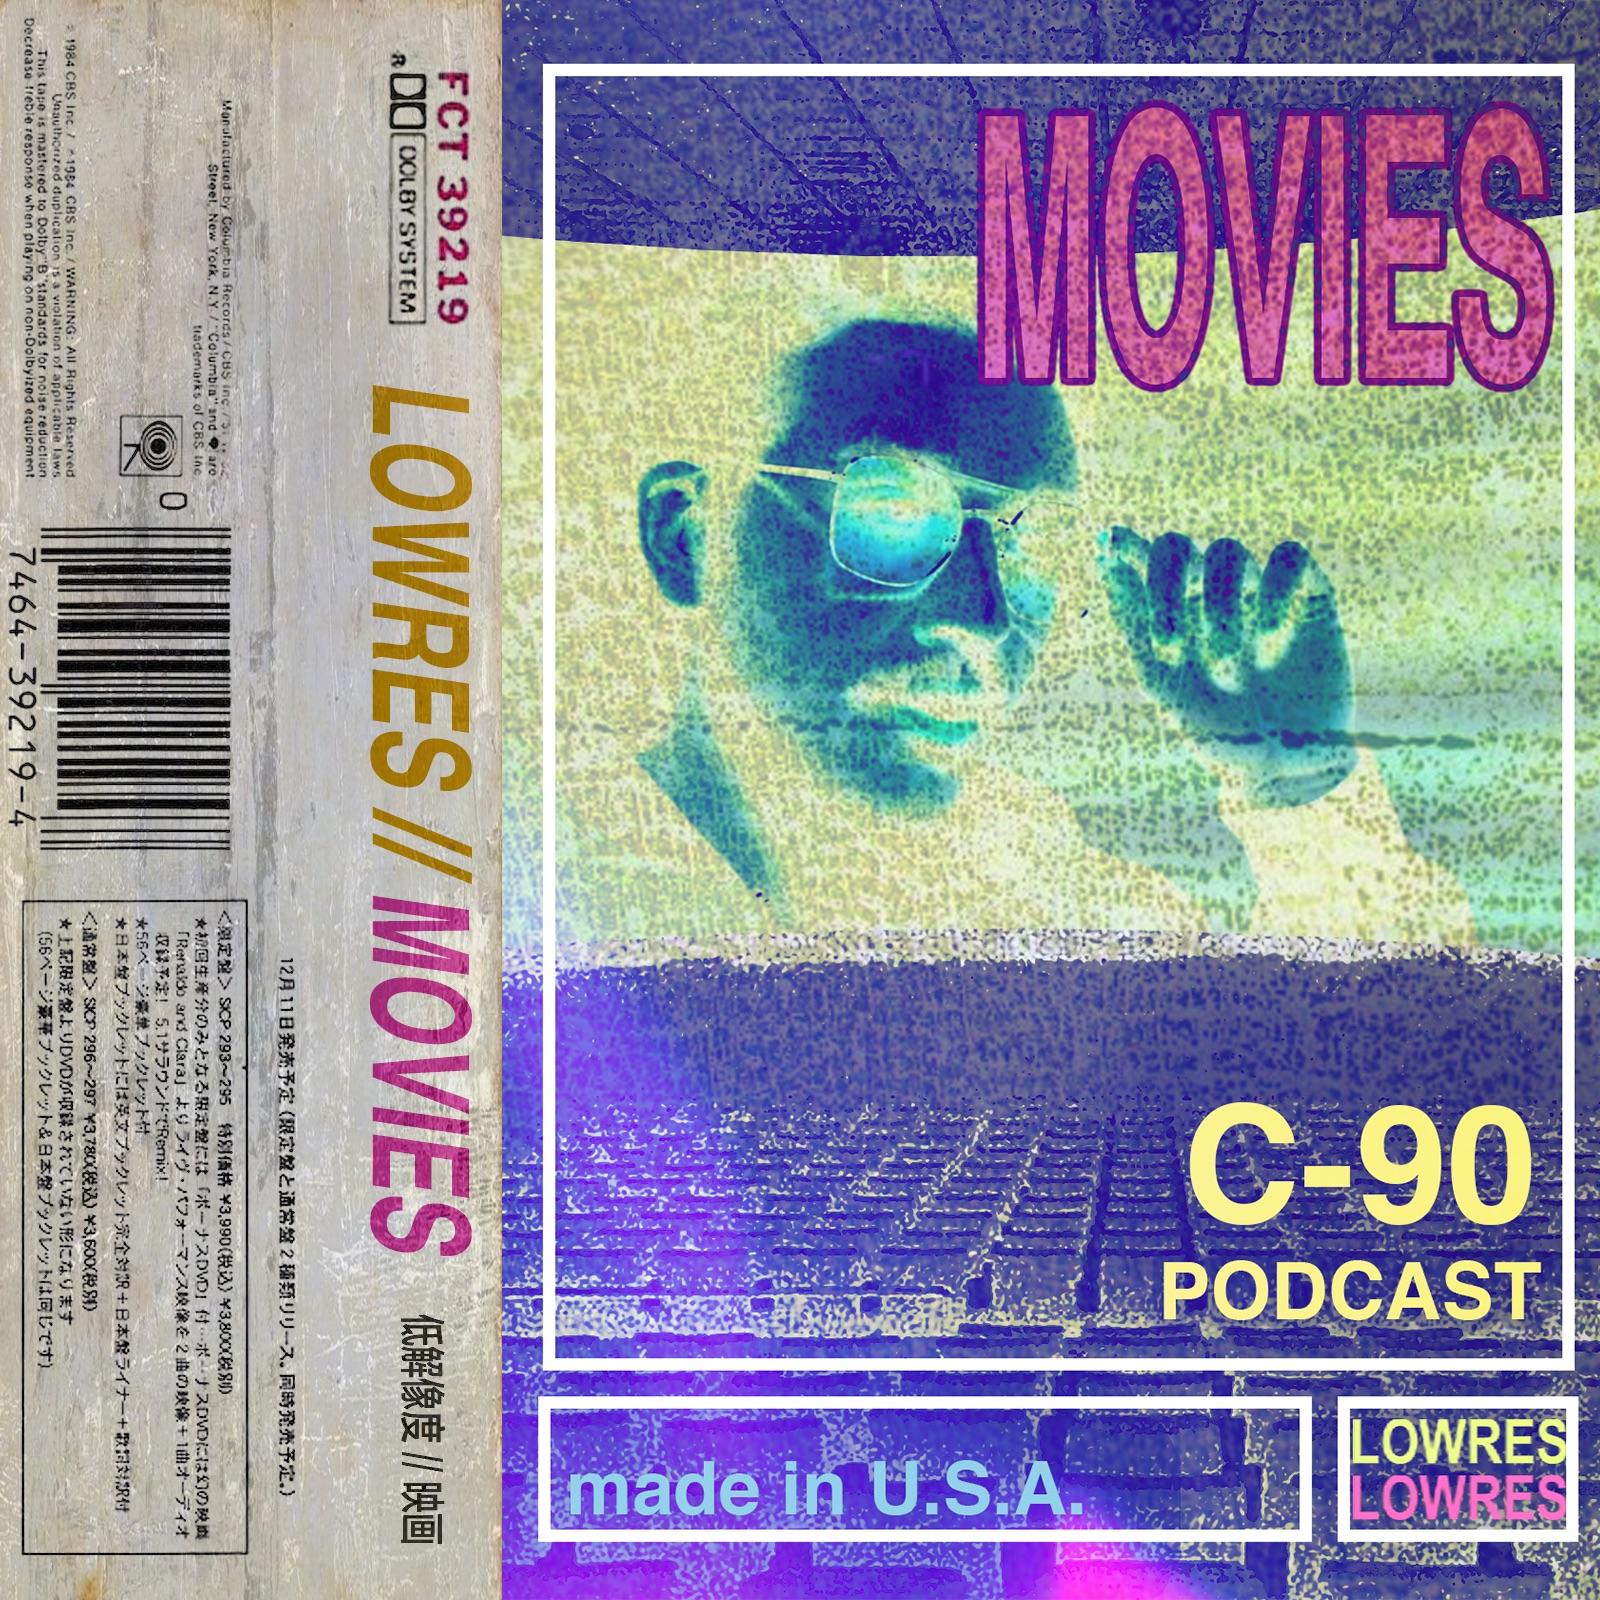 moviesitunes copy.jpg